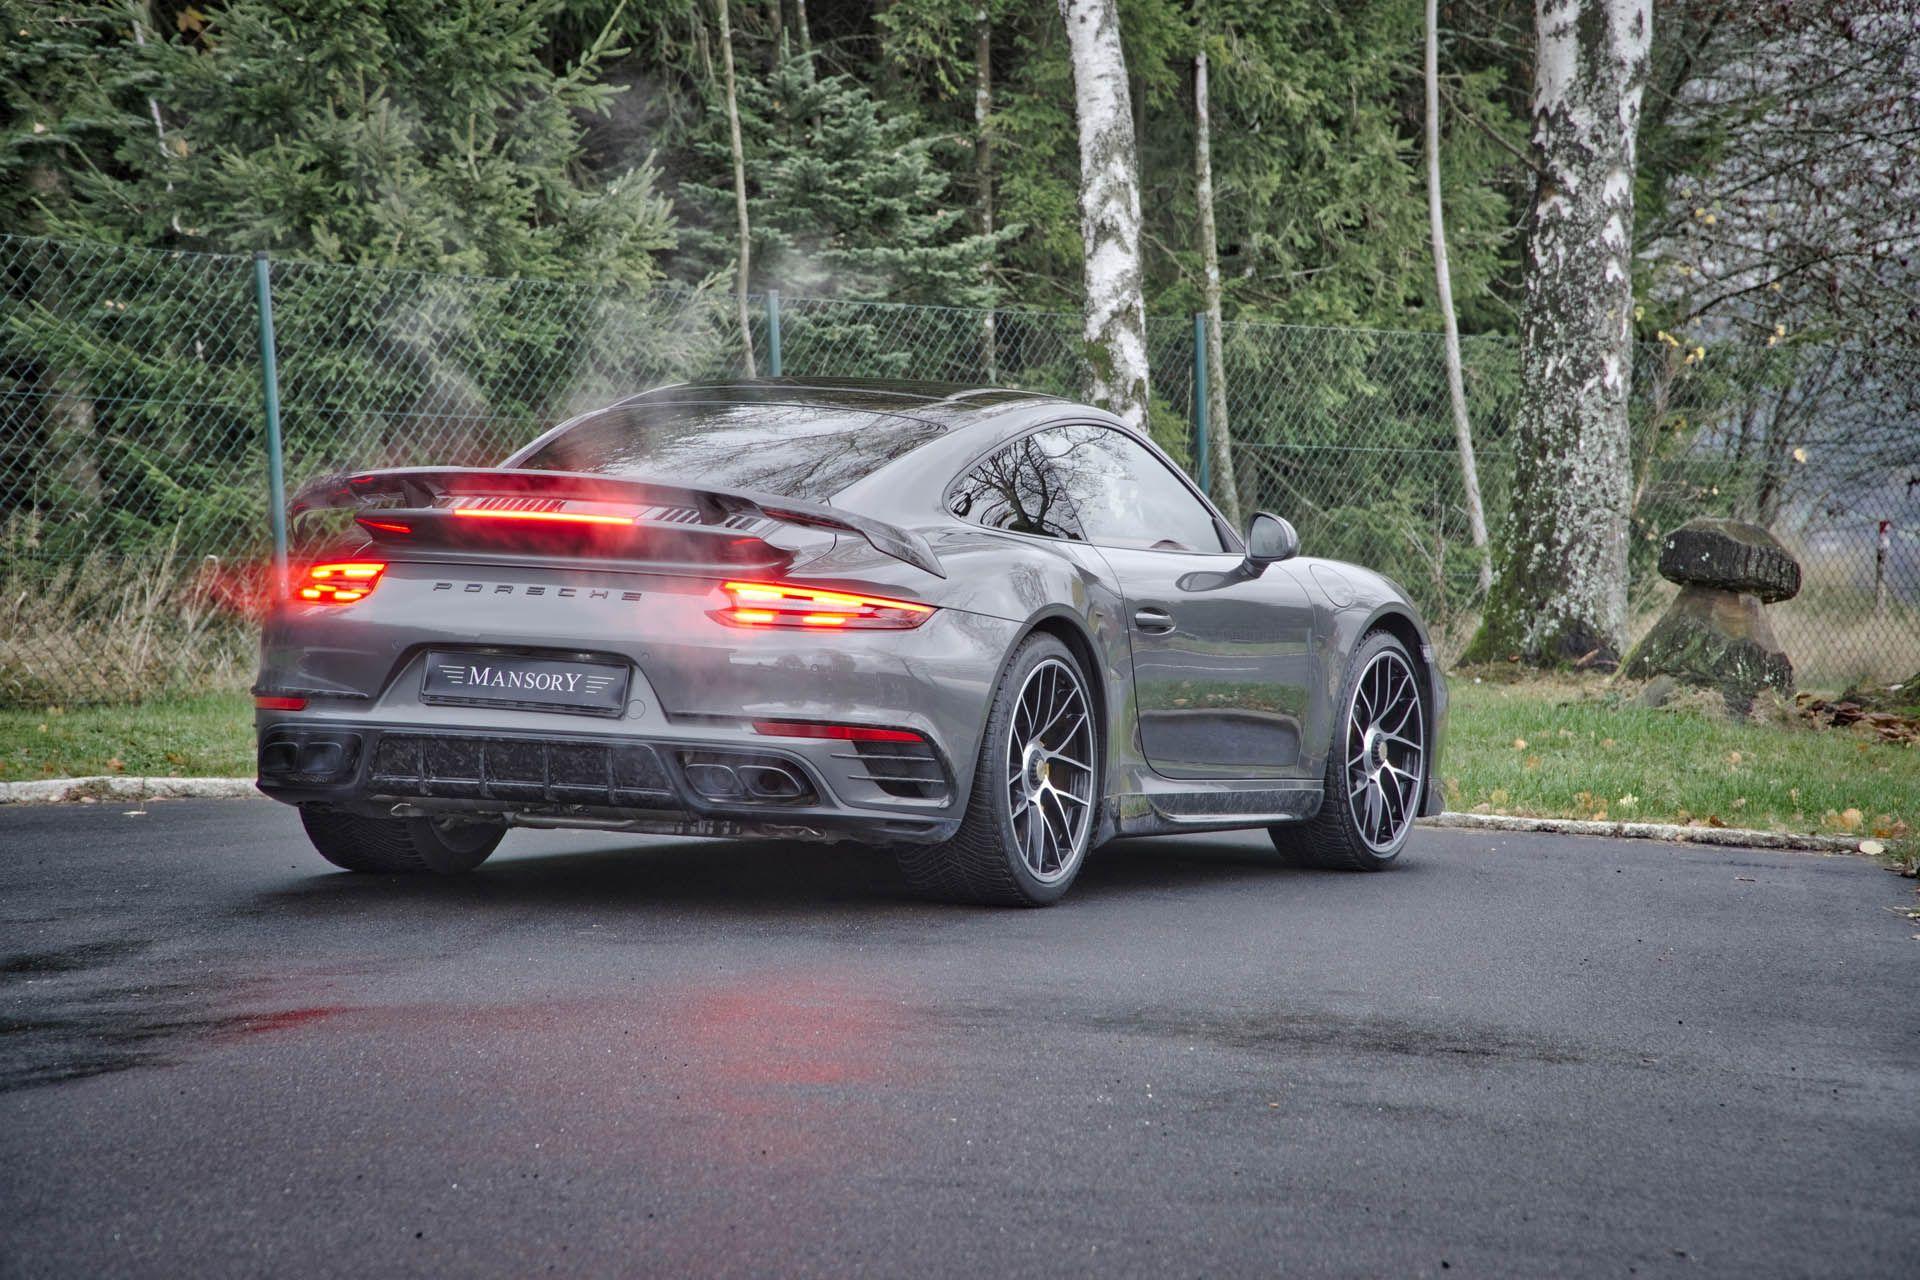 Porsche_911_Turb0_by_Mansory_0001